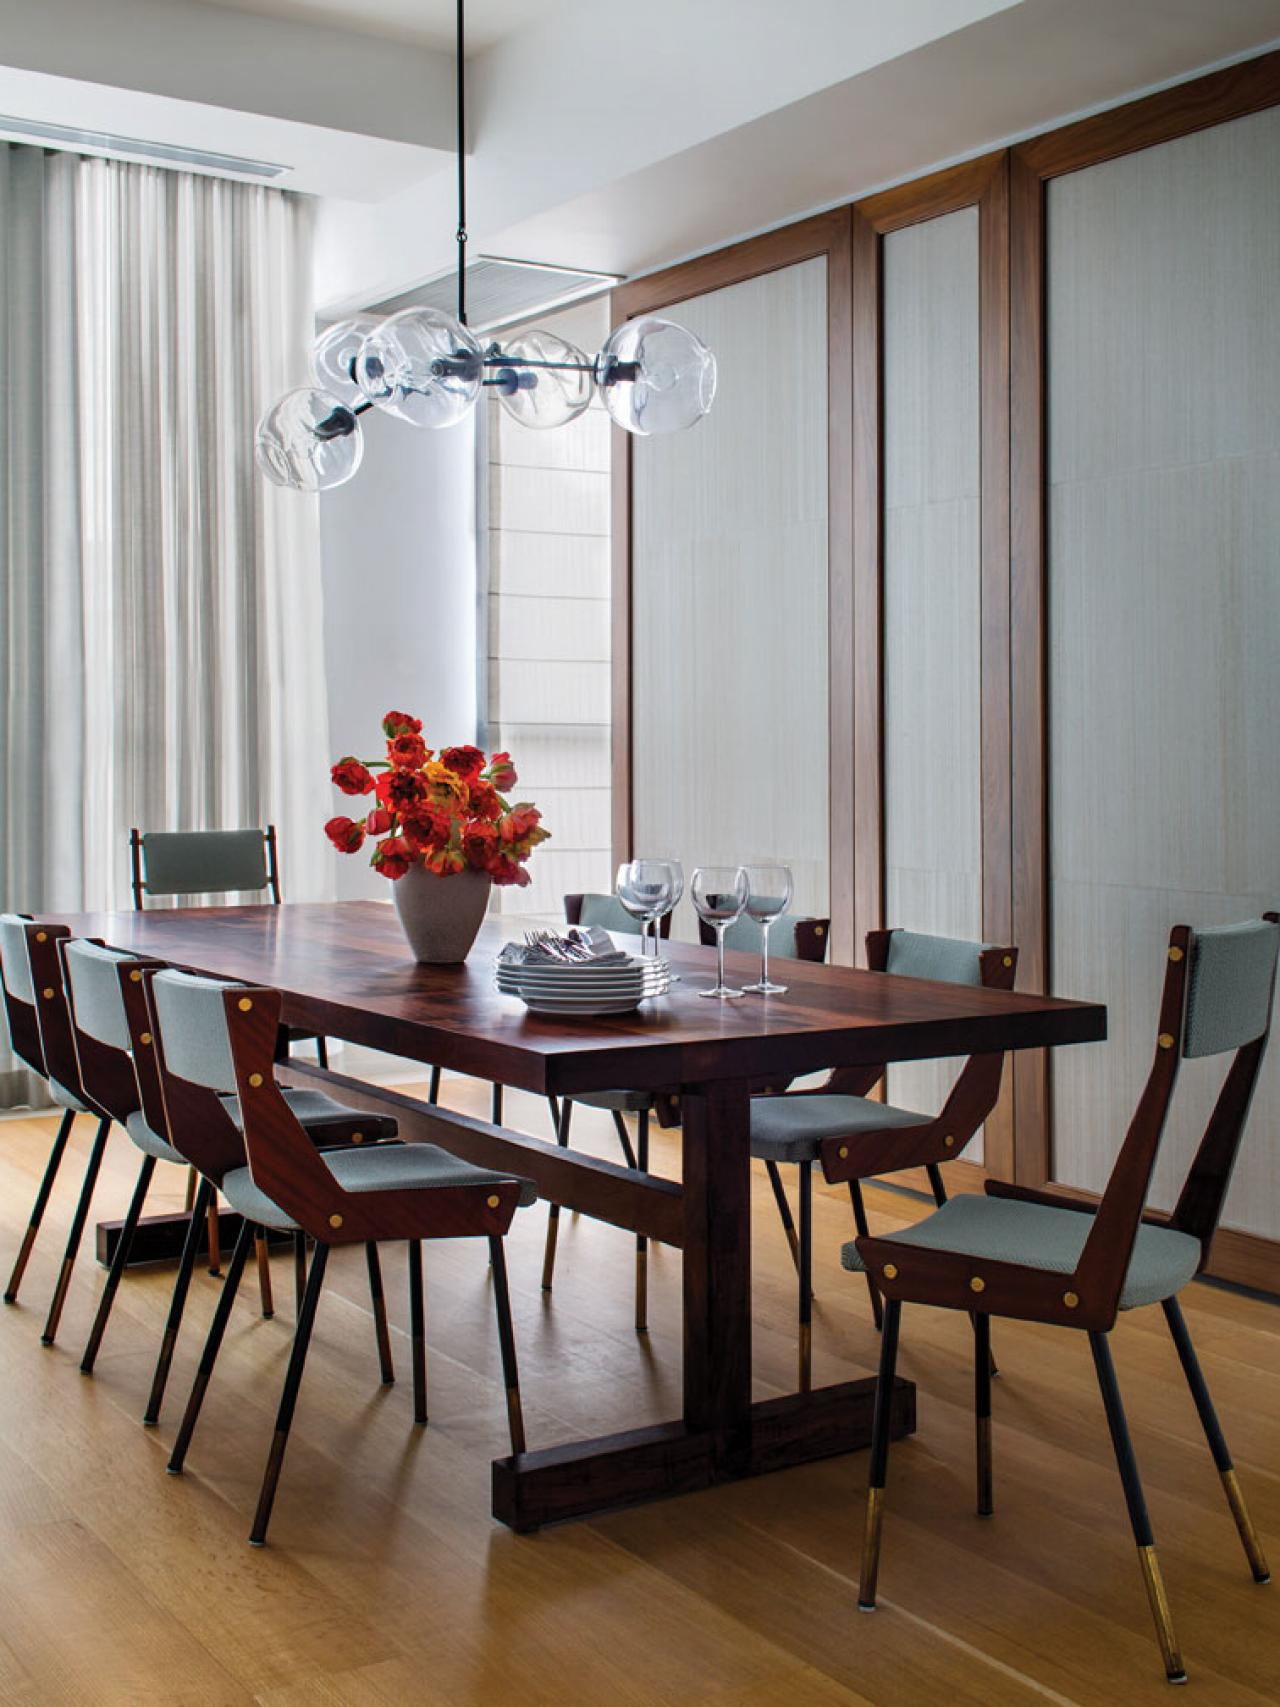 Midcentury Modern Dining Room With Globe Pendant Light